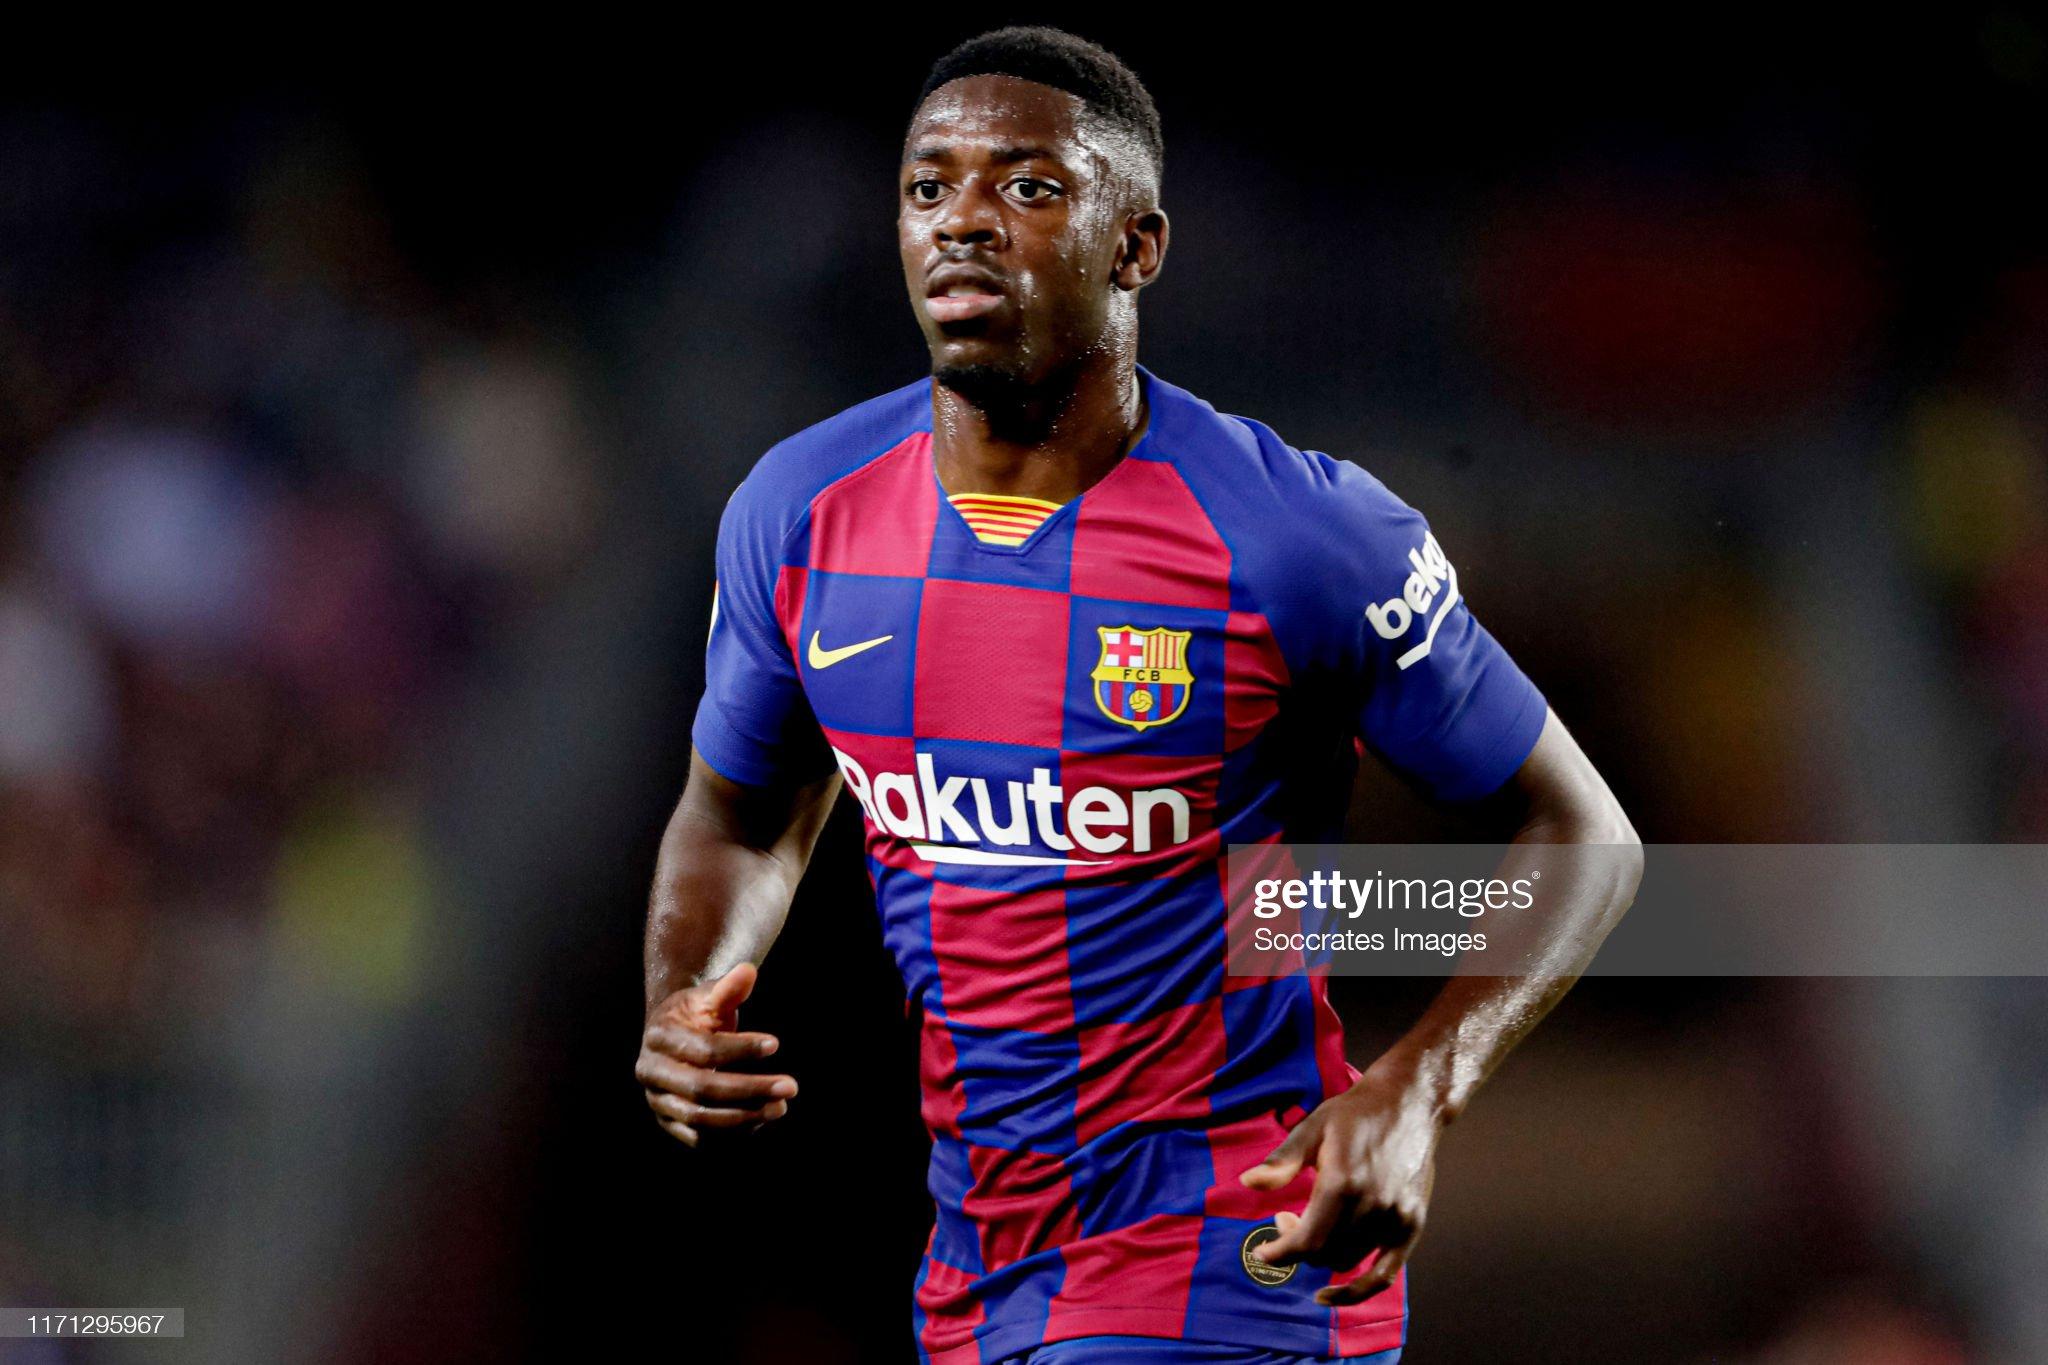 صور مباراة : برشلونة - فياريال 2-1 ( 24-09-2019 )  Ousmane-dembele-of-fc-barcelona-during-the-la-liga-santander-match-picture-id1171295967?s=2048x2048